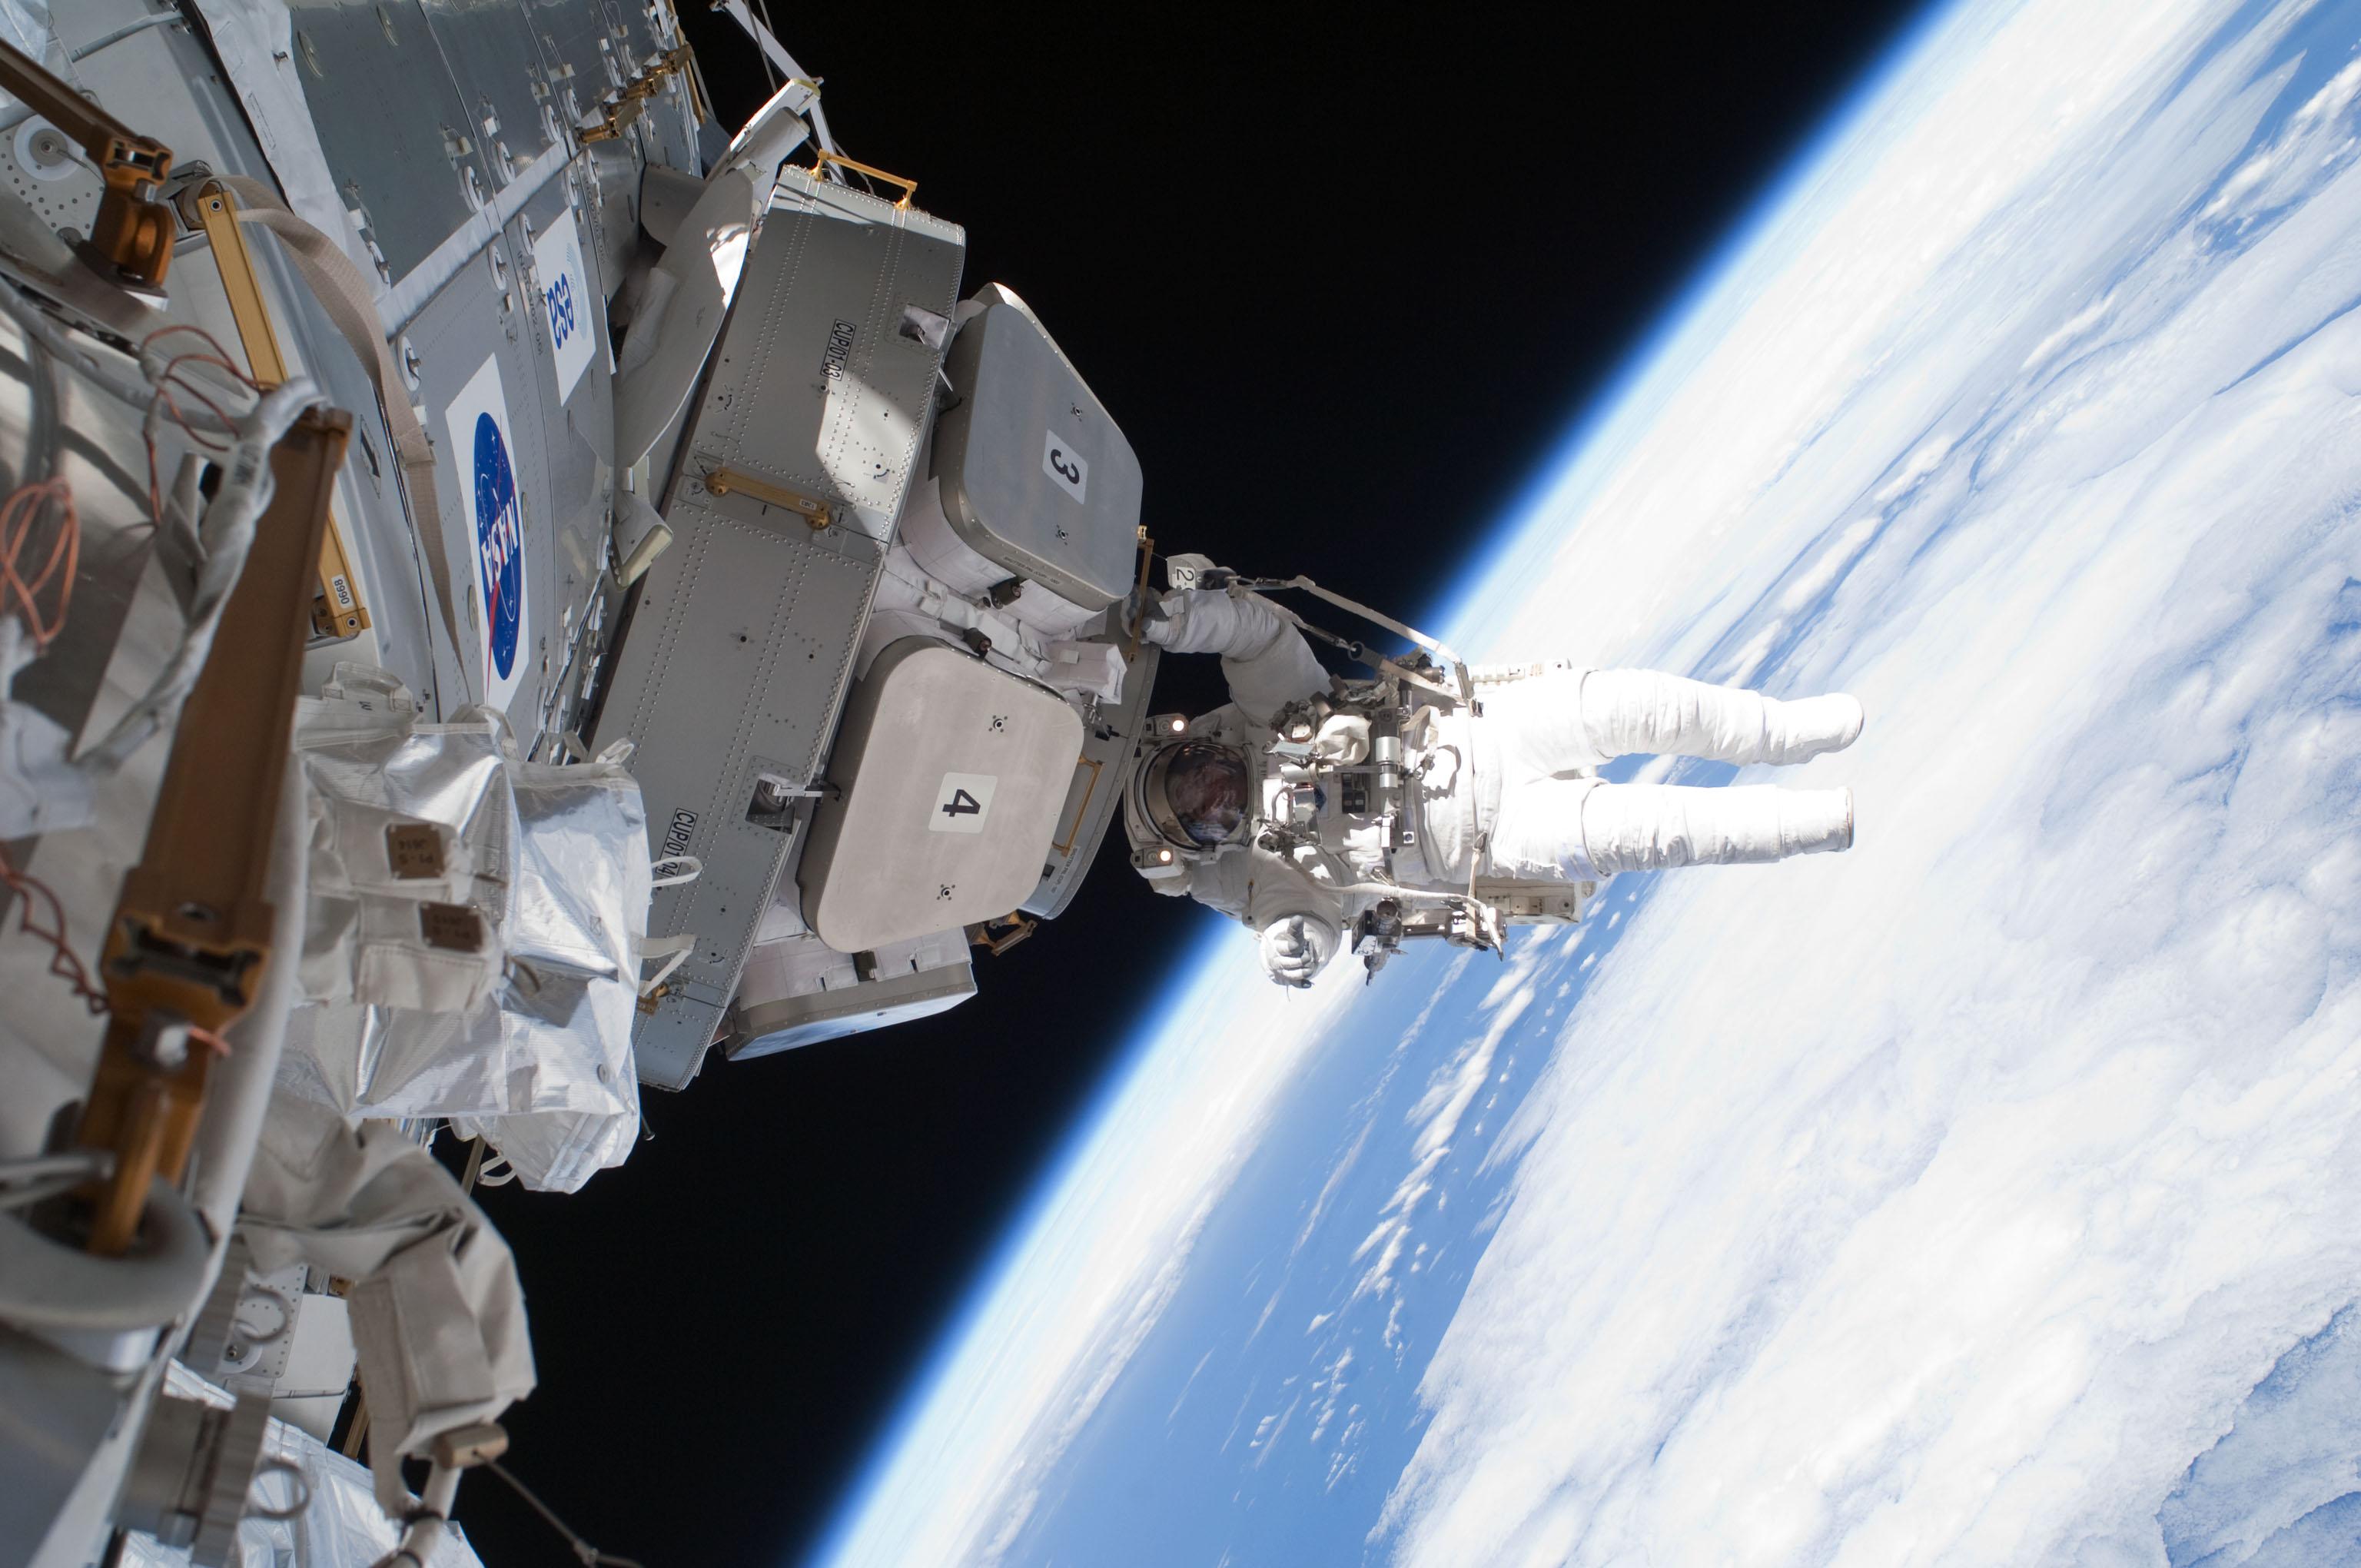 STS-130_EVA3_Nicholas_Patrick_iss022e066872_full_view_crop.jpg